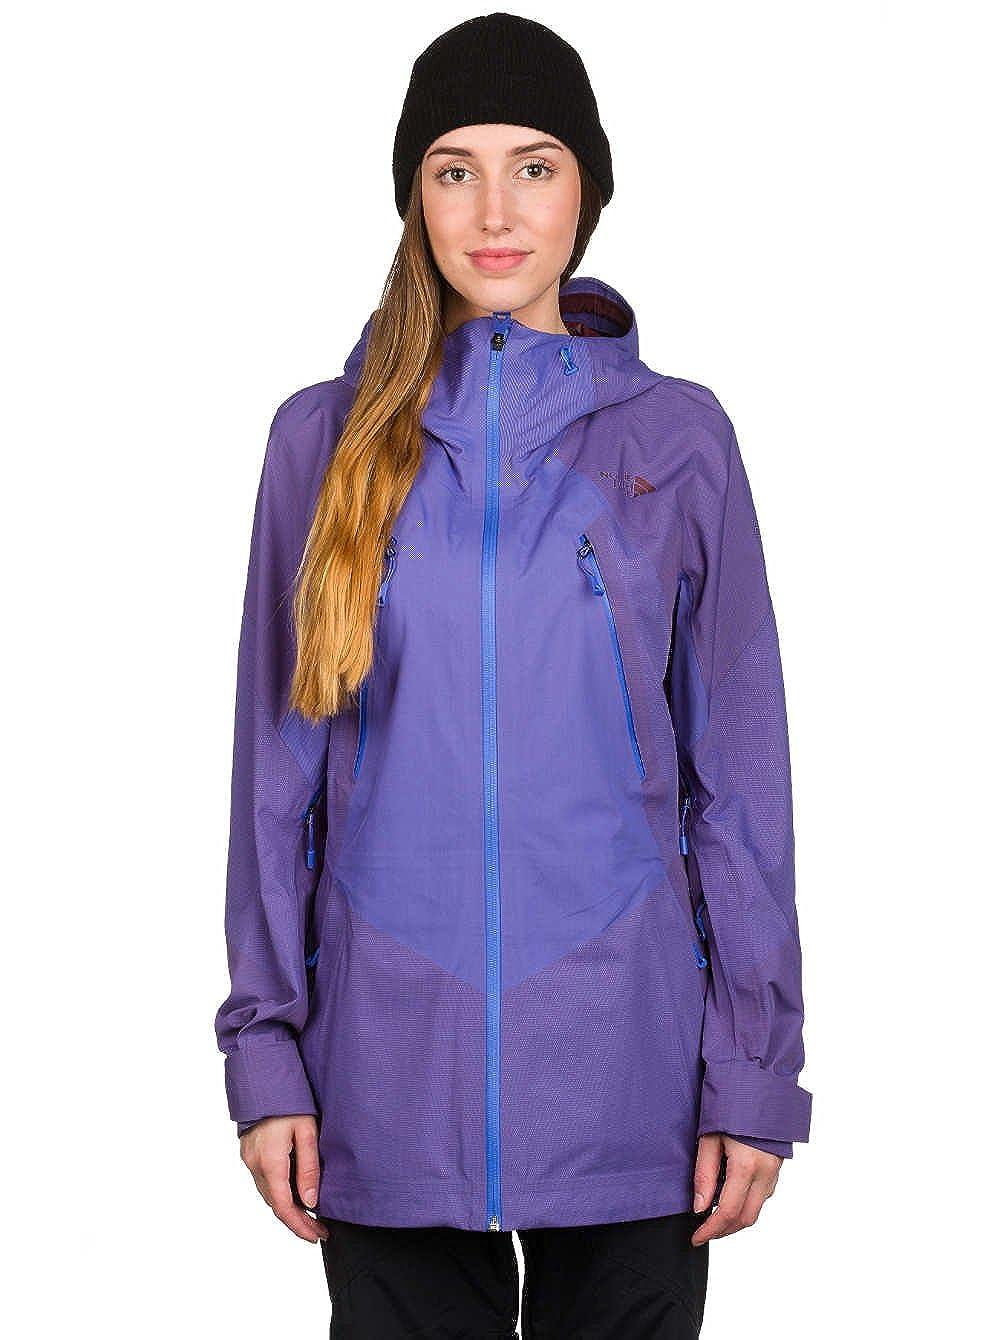 c419481e5 The North Face Women's FUSEFORM Brigandine 3L Jacket (Medium ...